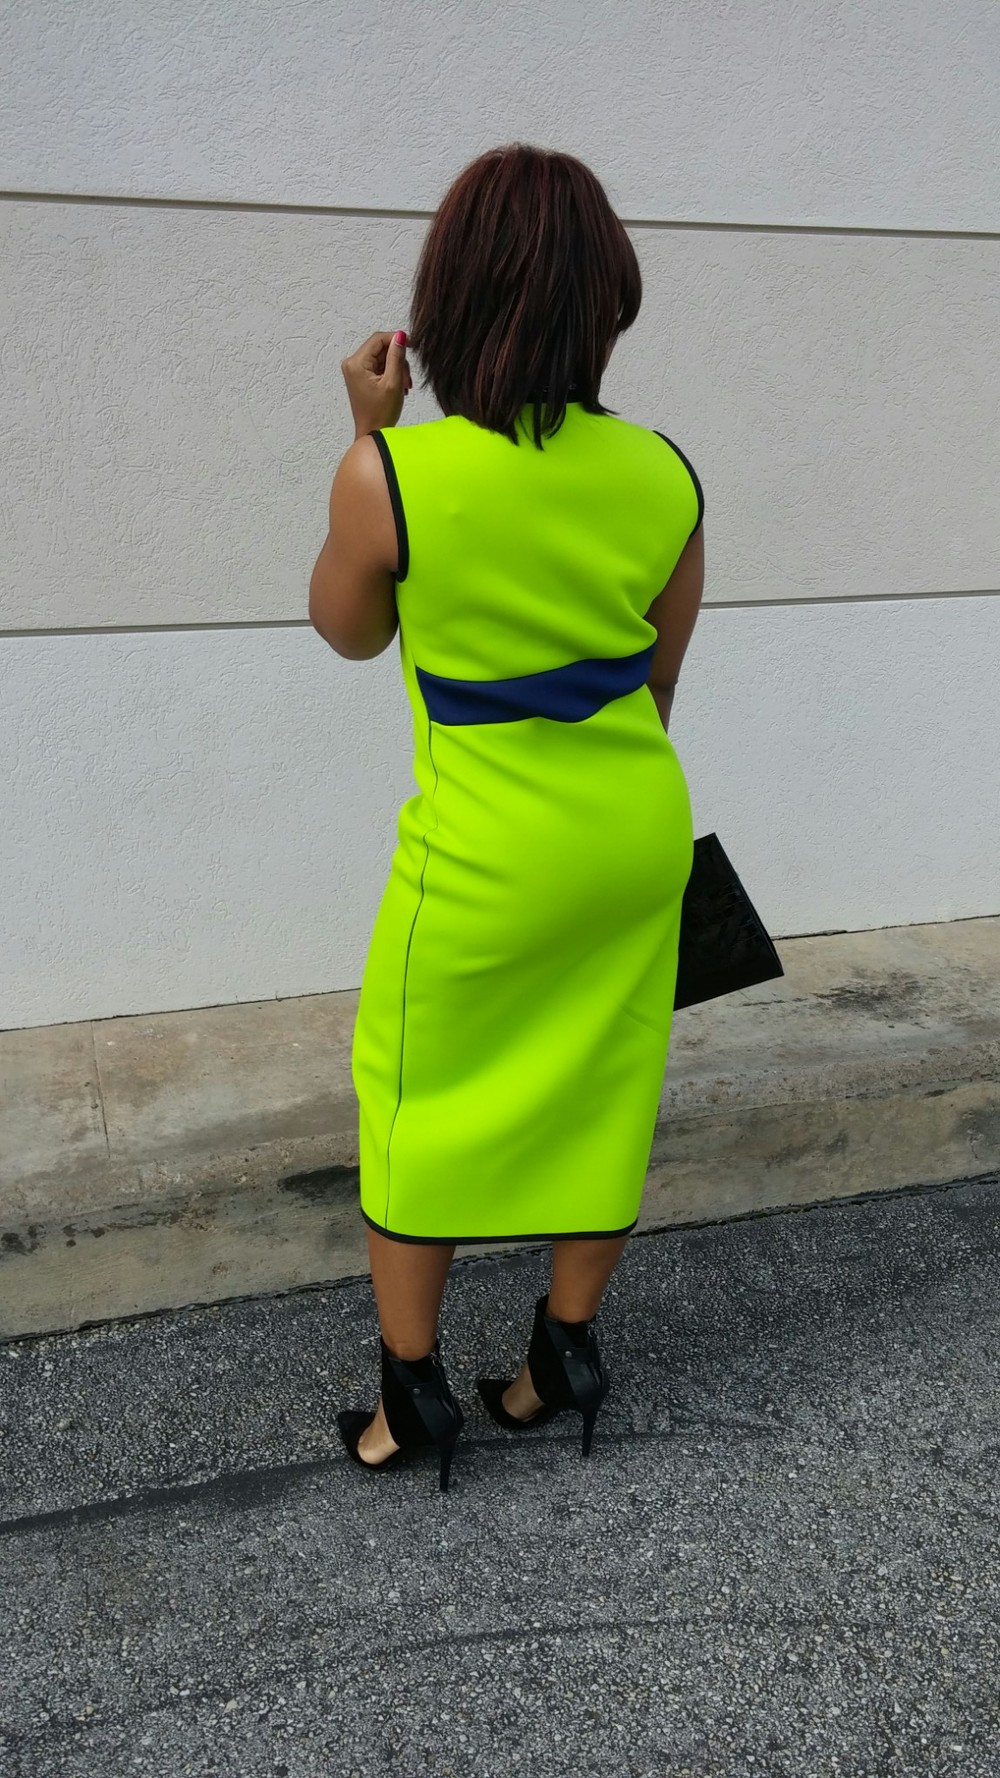 Neon Green Neoprene Dress by 3degreesdb.com